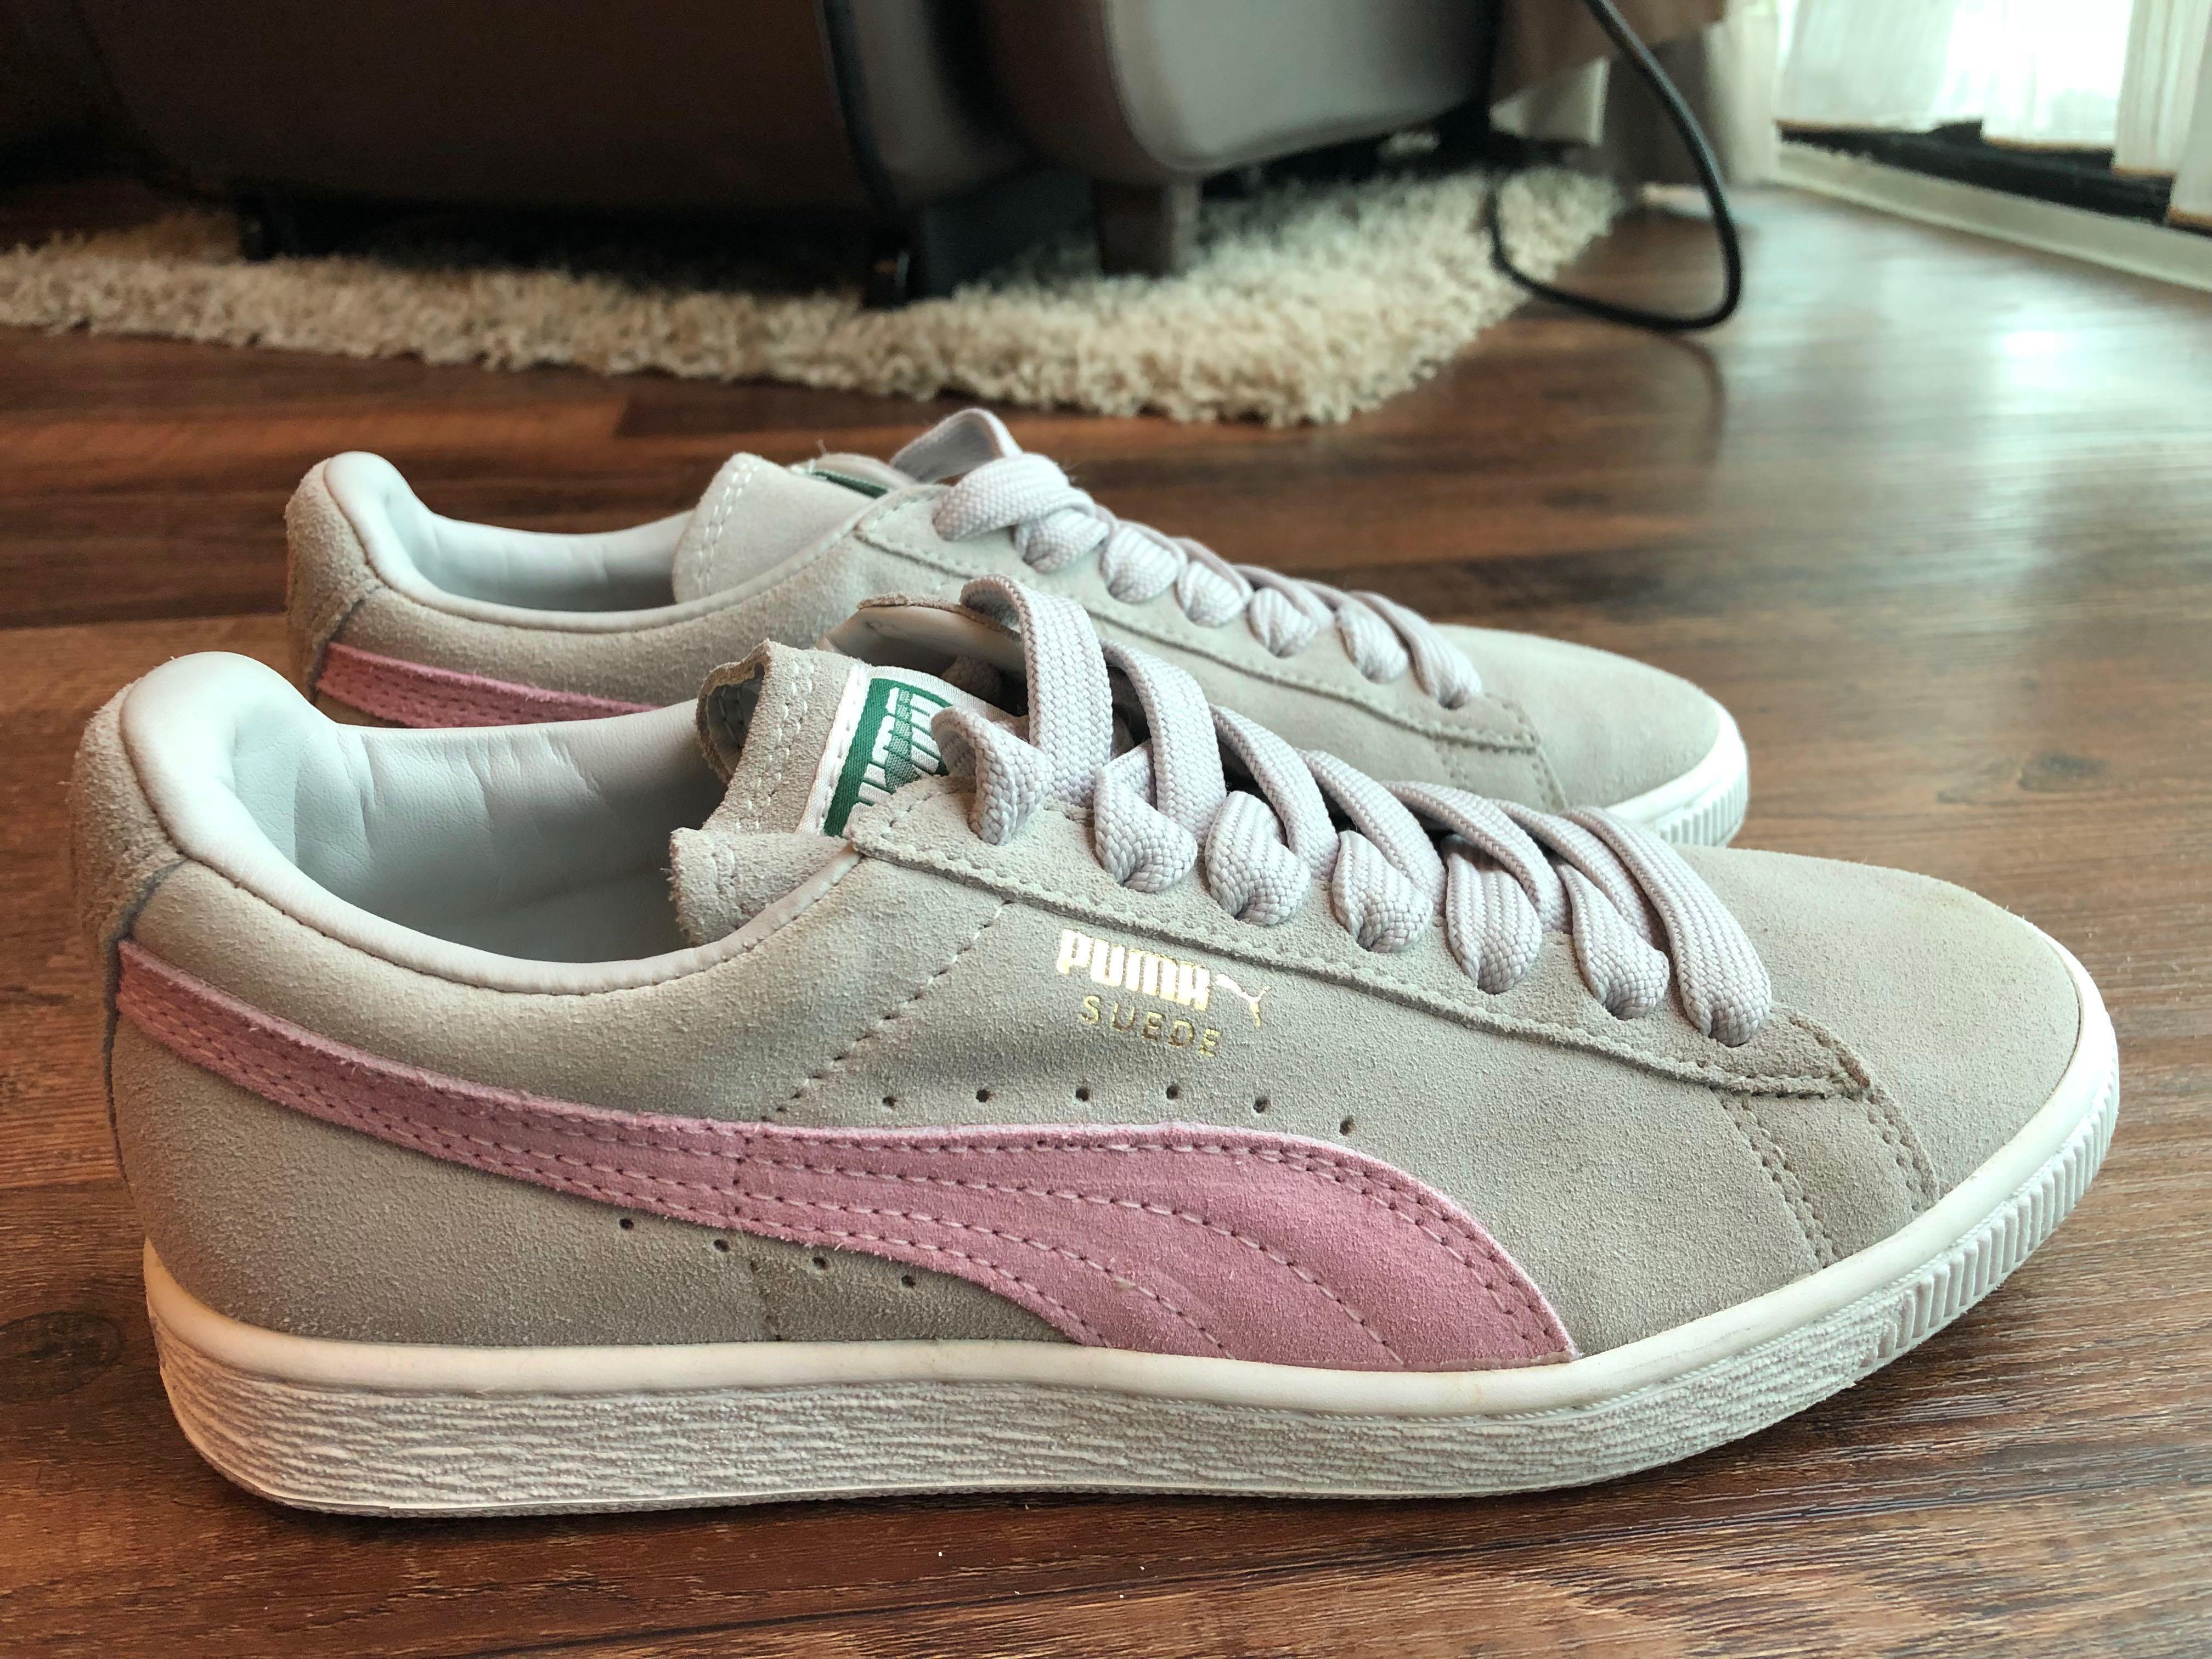 Original Women's Puma Suede Sneakers